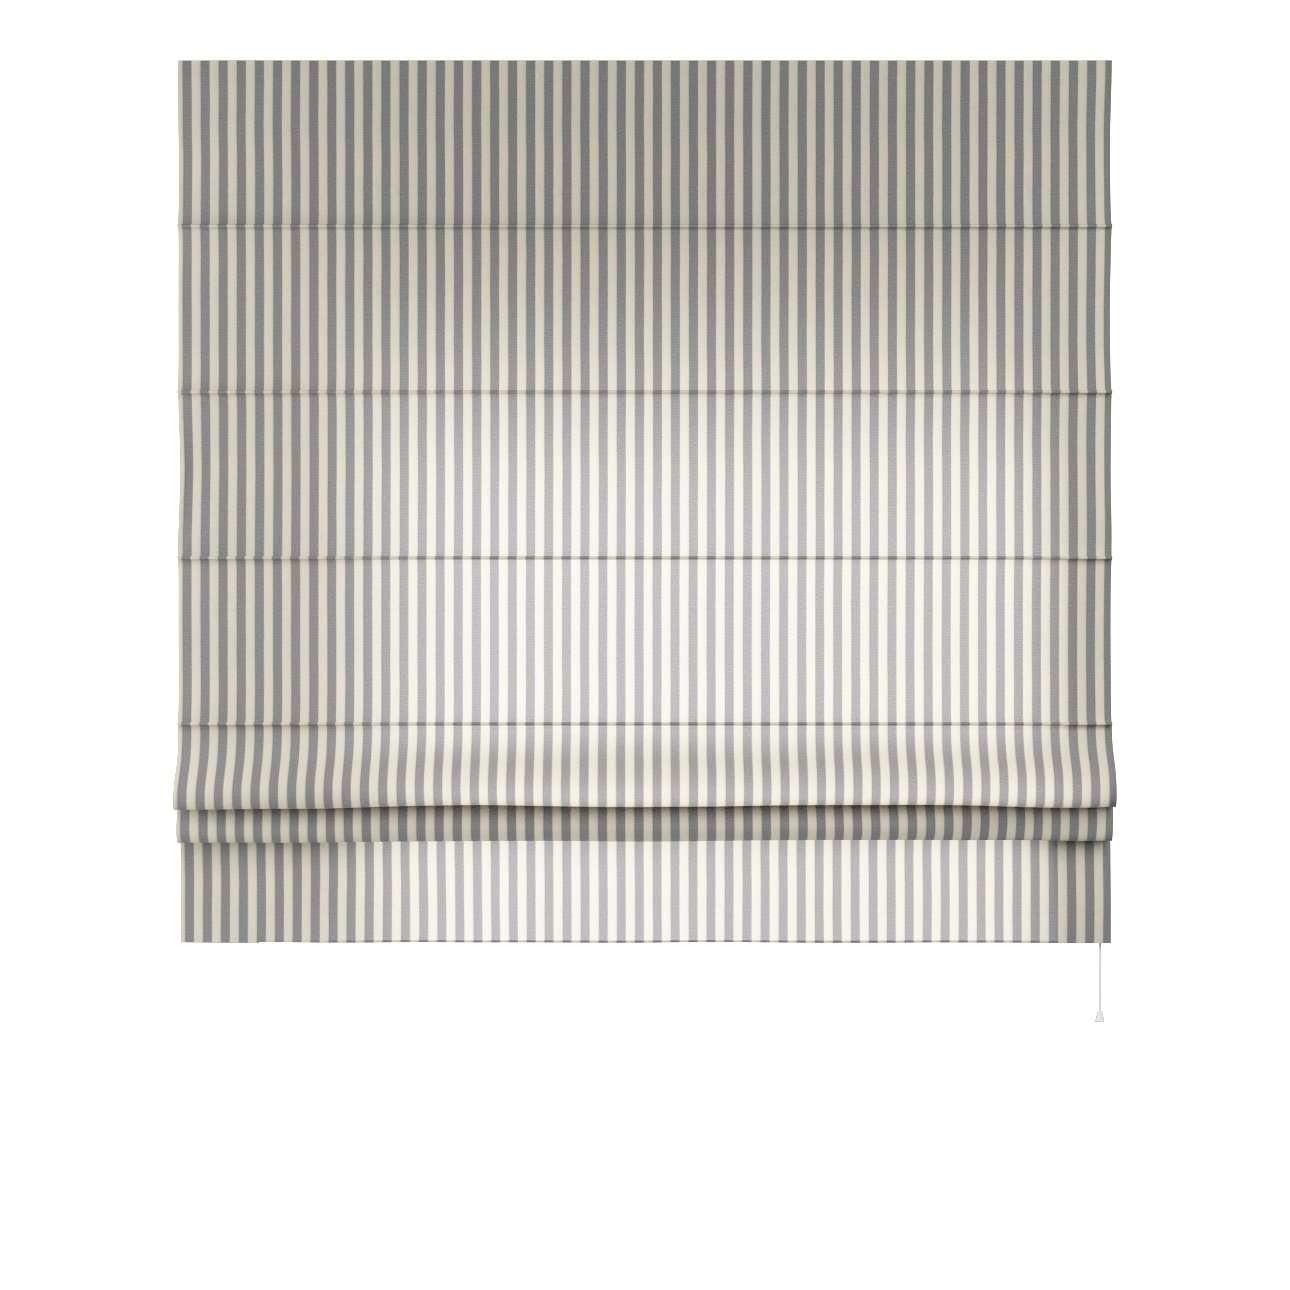 Raffrollo Padva 80 x 170 cm von der Kollektion Quadro, Stoff: 136-02